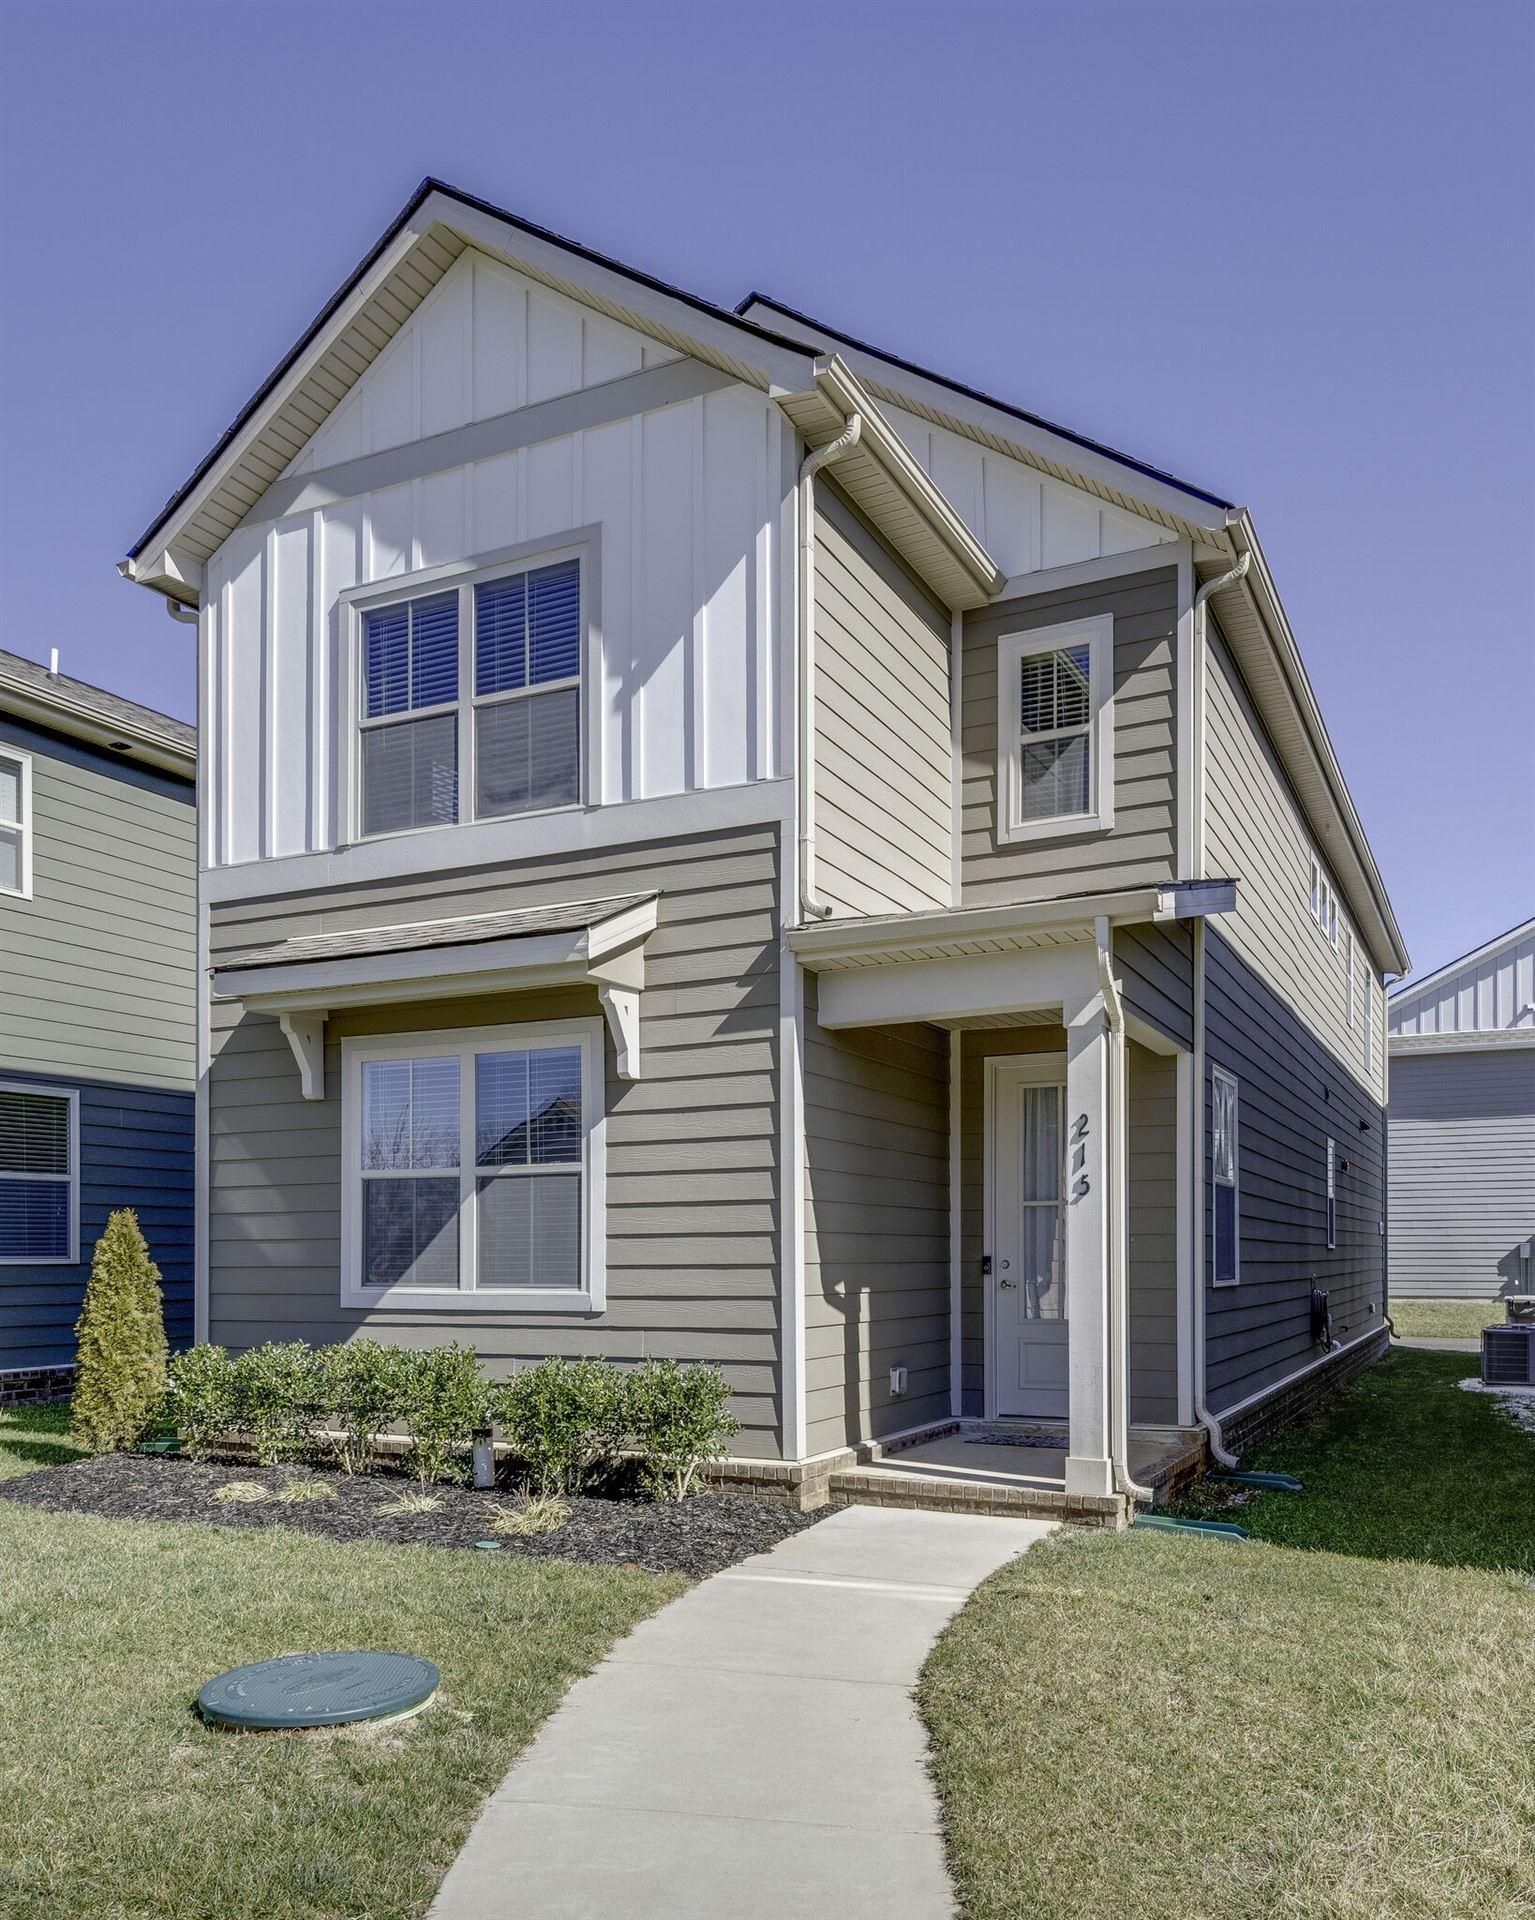 215 Manor Row, Pleasant View, TN 37146 - MLS#: 2229404